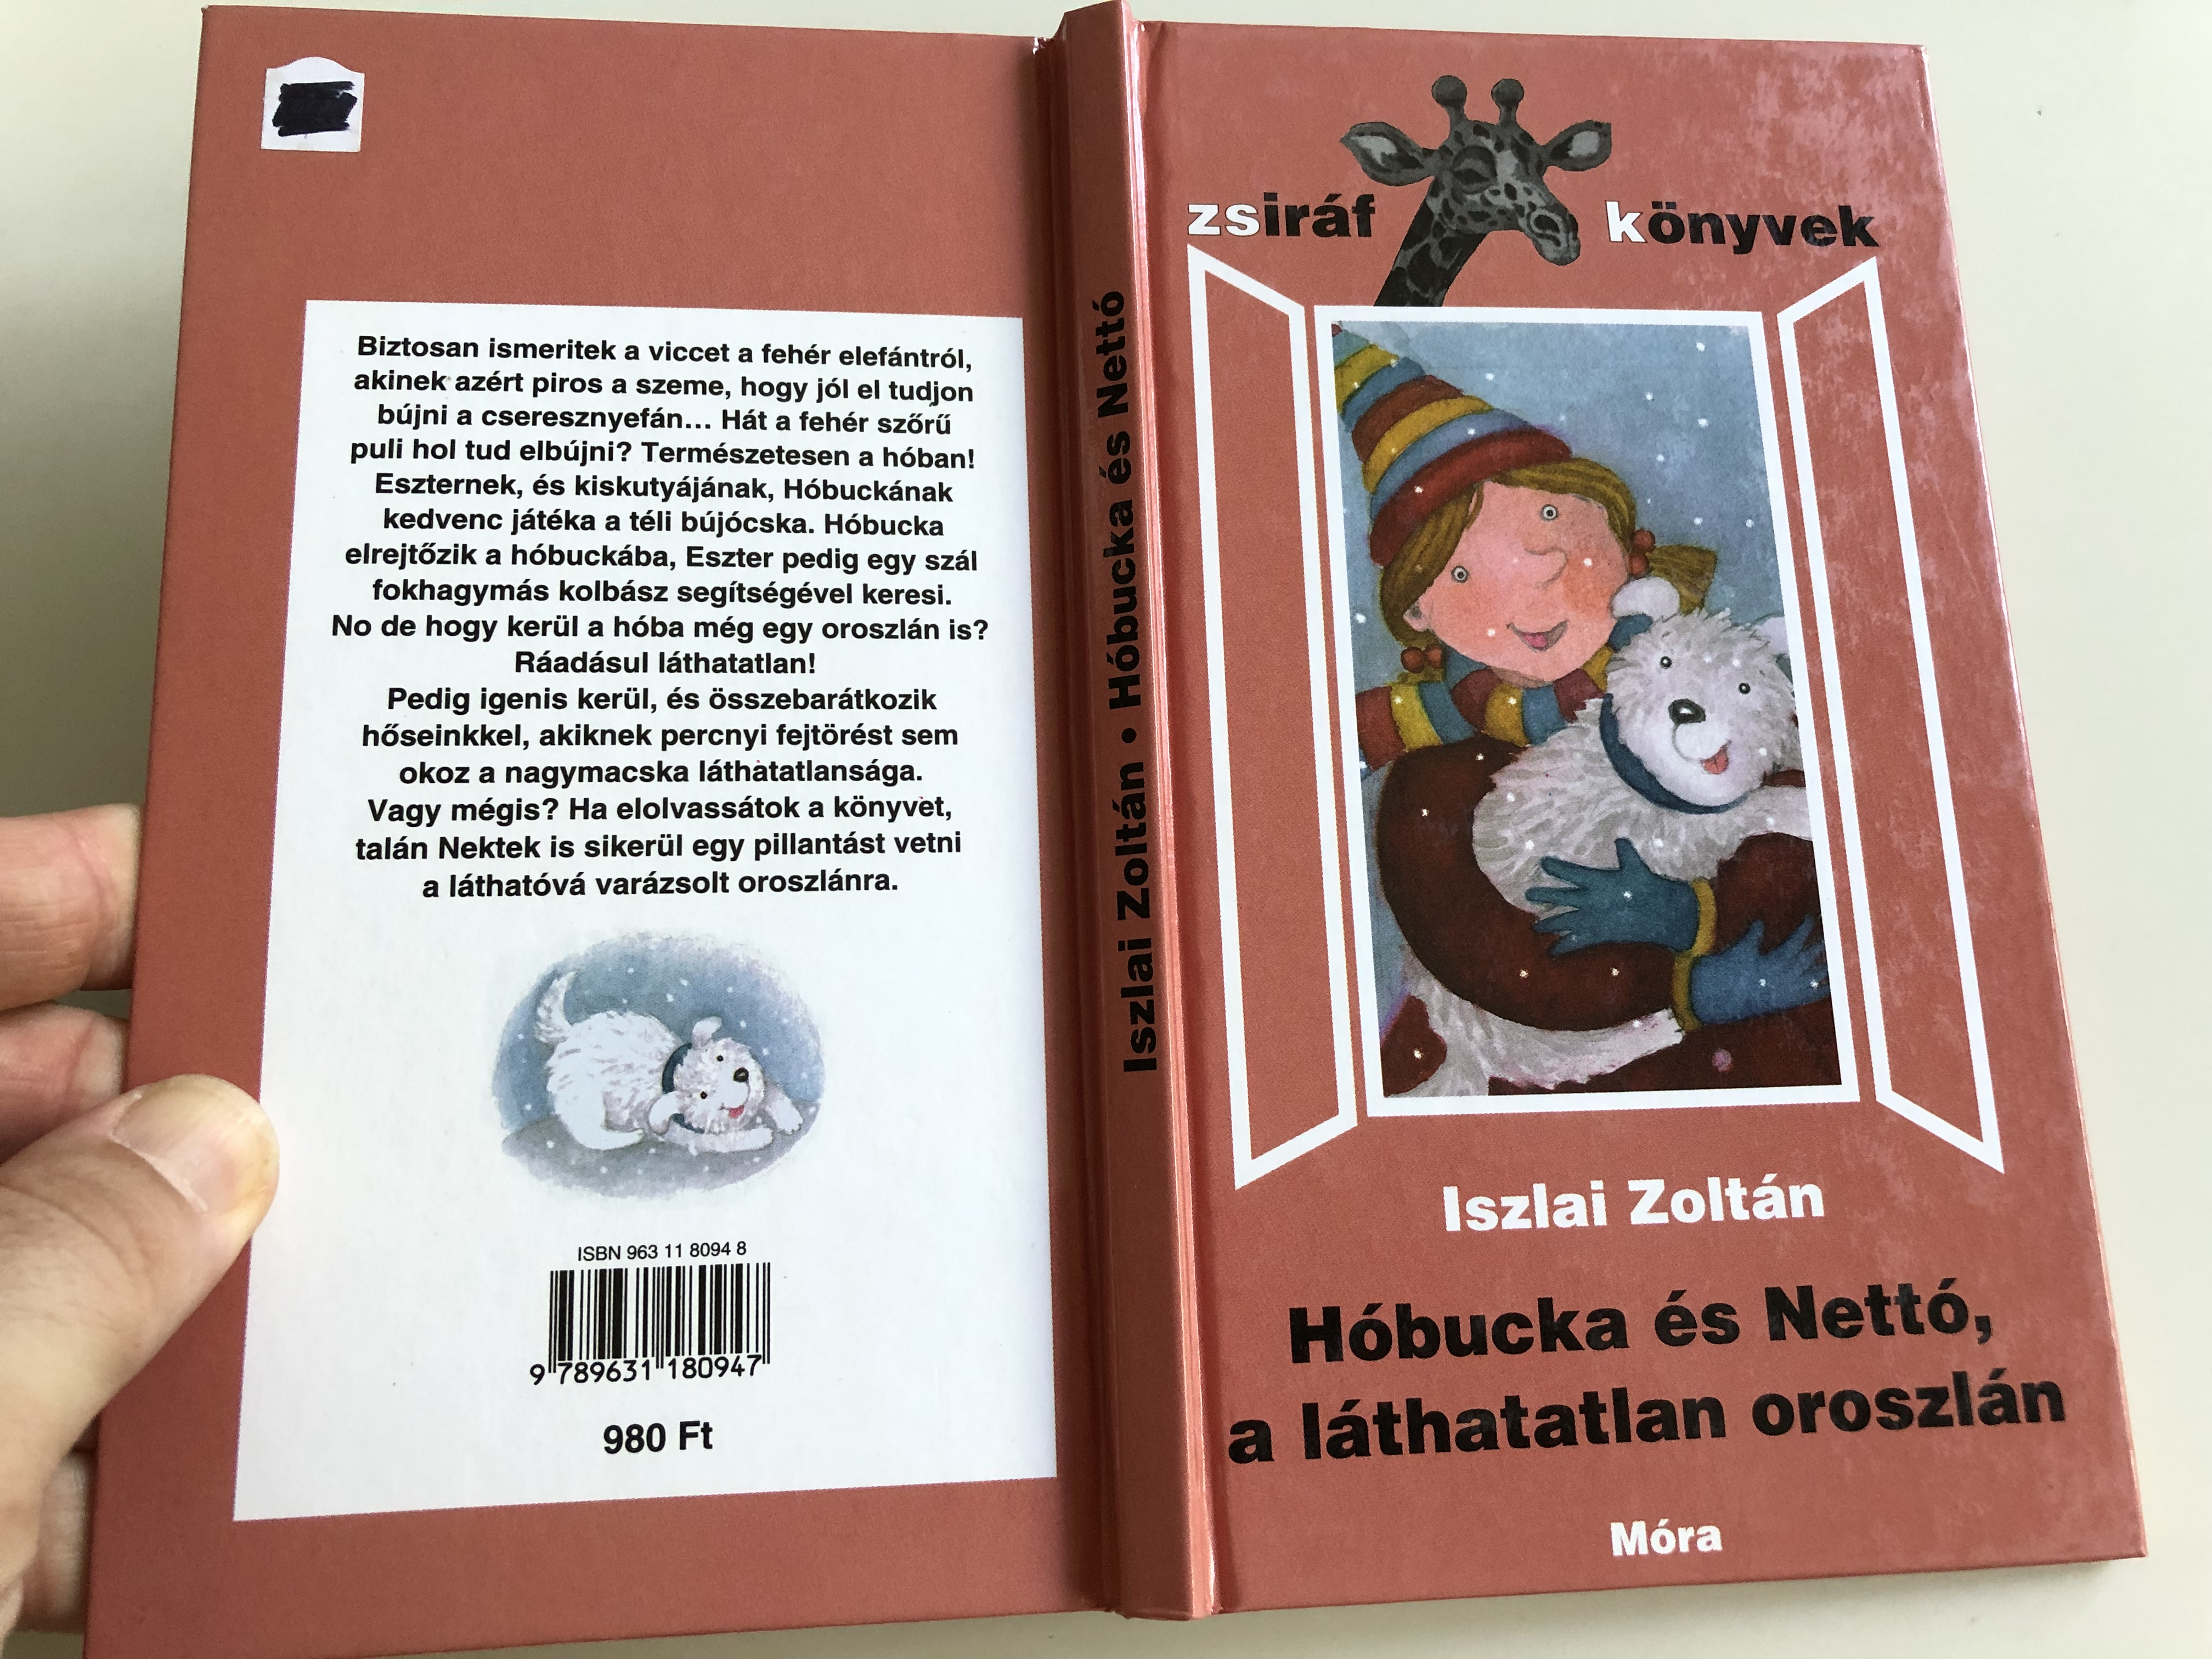 h-bucka-s-nett-a-l-thatatlan-oroszl-n-by-iszlai-zolt-n-hungarian-stories-about-an-invisible-lion-zsir-f-k-nyvek-m-ra-k-nyvkiad-2005-10-.jpg